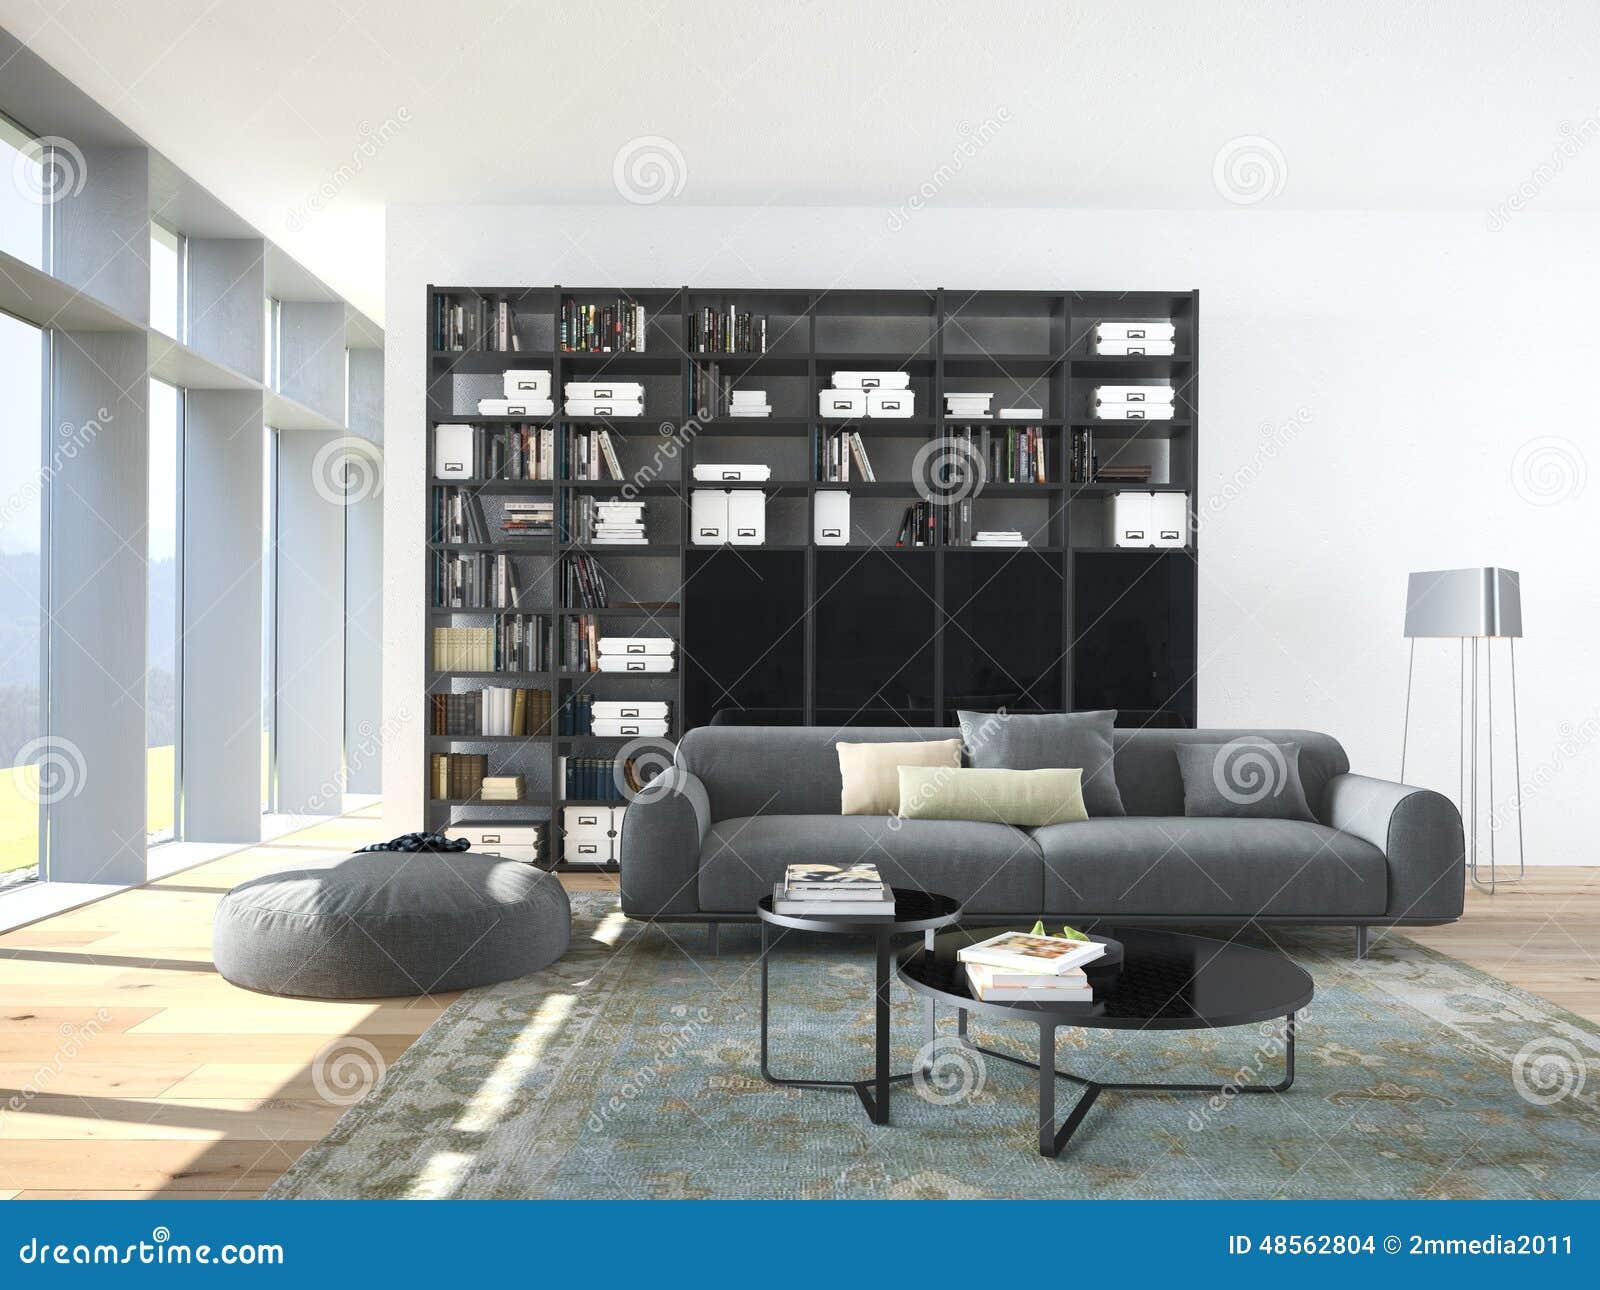 Boekenkast In Woonkamer : Woonkamer met houten trap en boekenkast stock illustratie nieuw